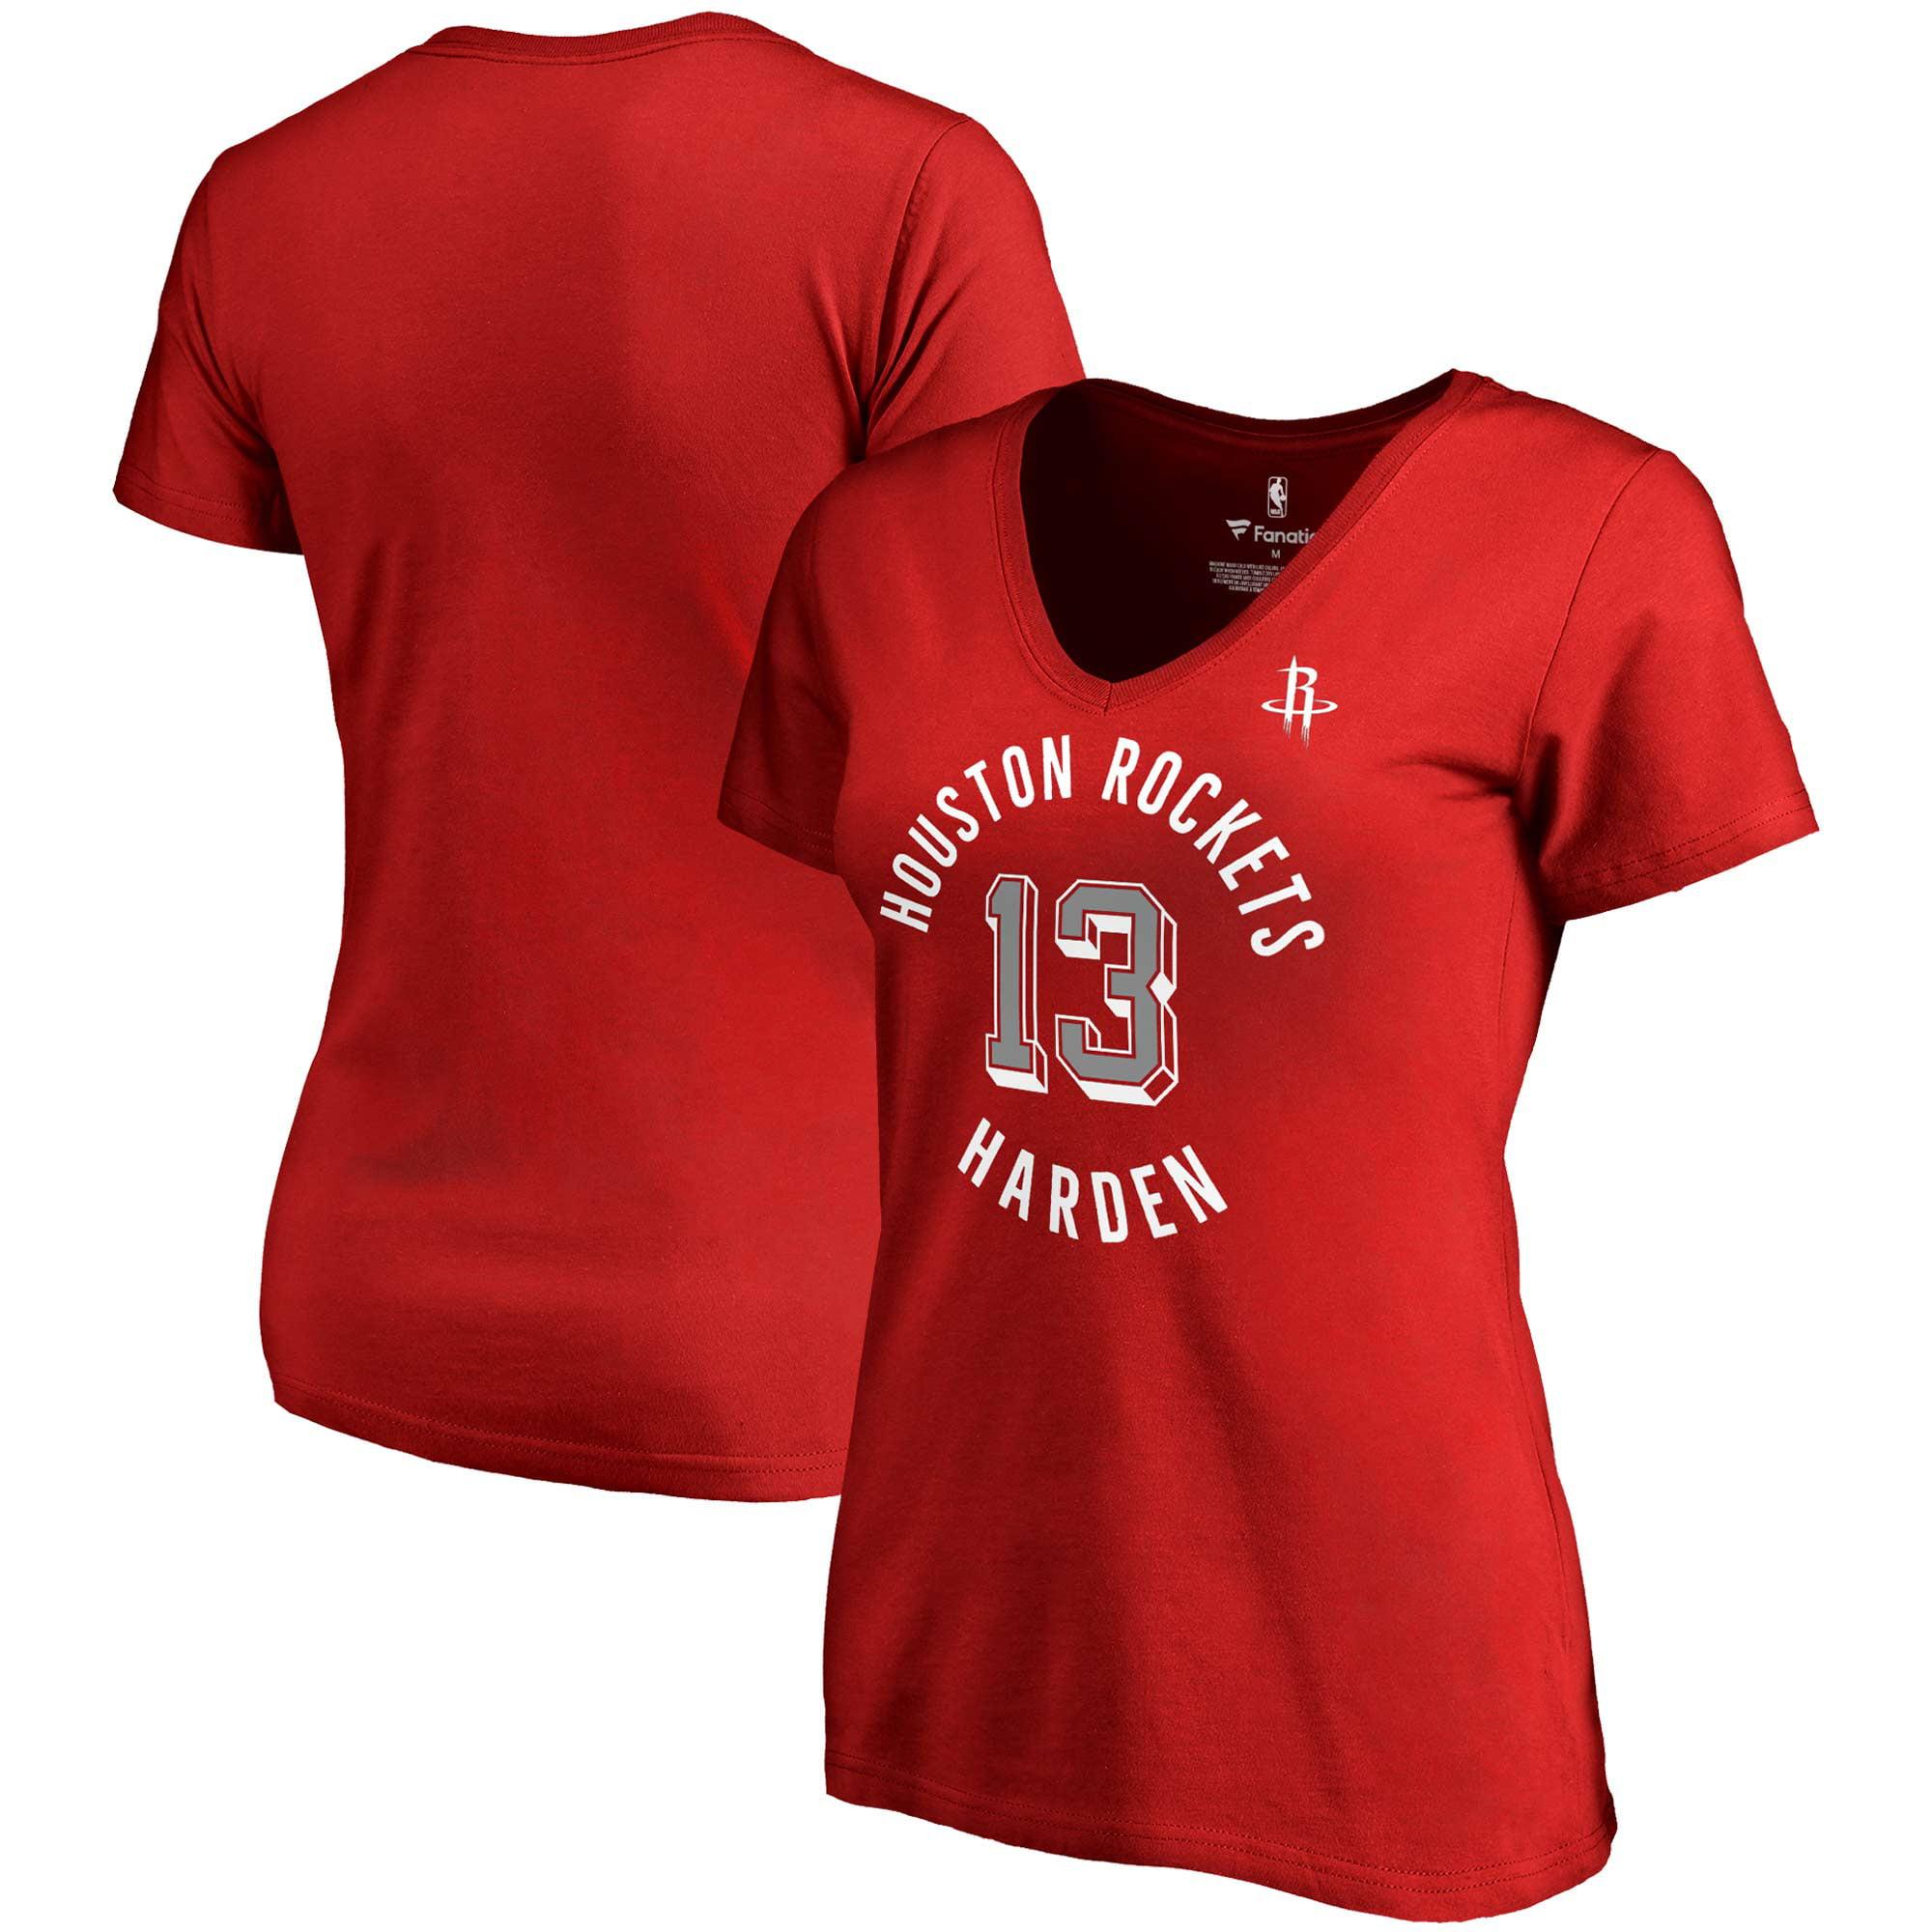 James Harden Houston Rockets Fanatics Branded Women's Notable Name & Number V-Neck T-Shirt - Red